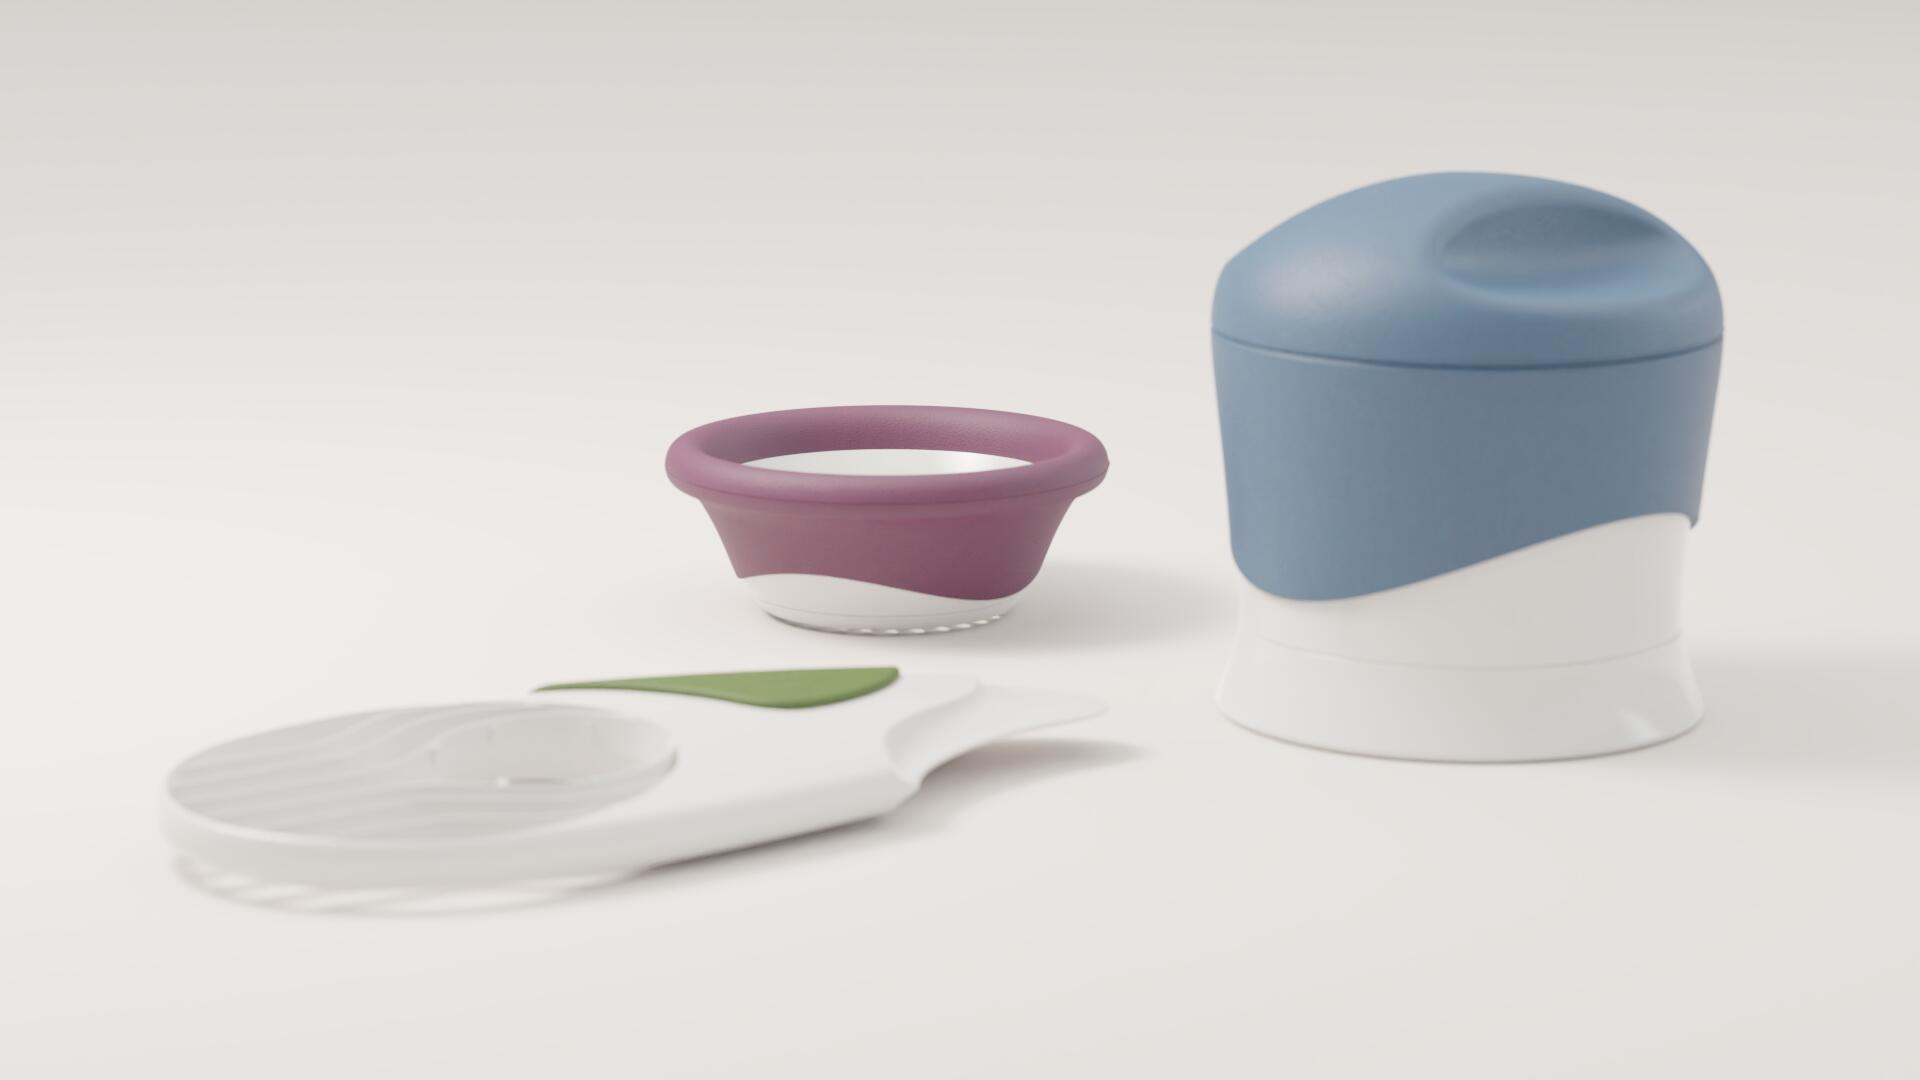 VEGGIE TOOLS Kitchen Utensils by ALOS. Product Design Studio.